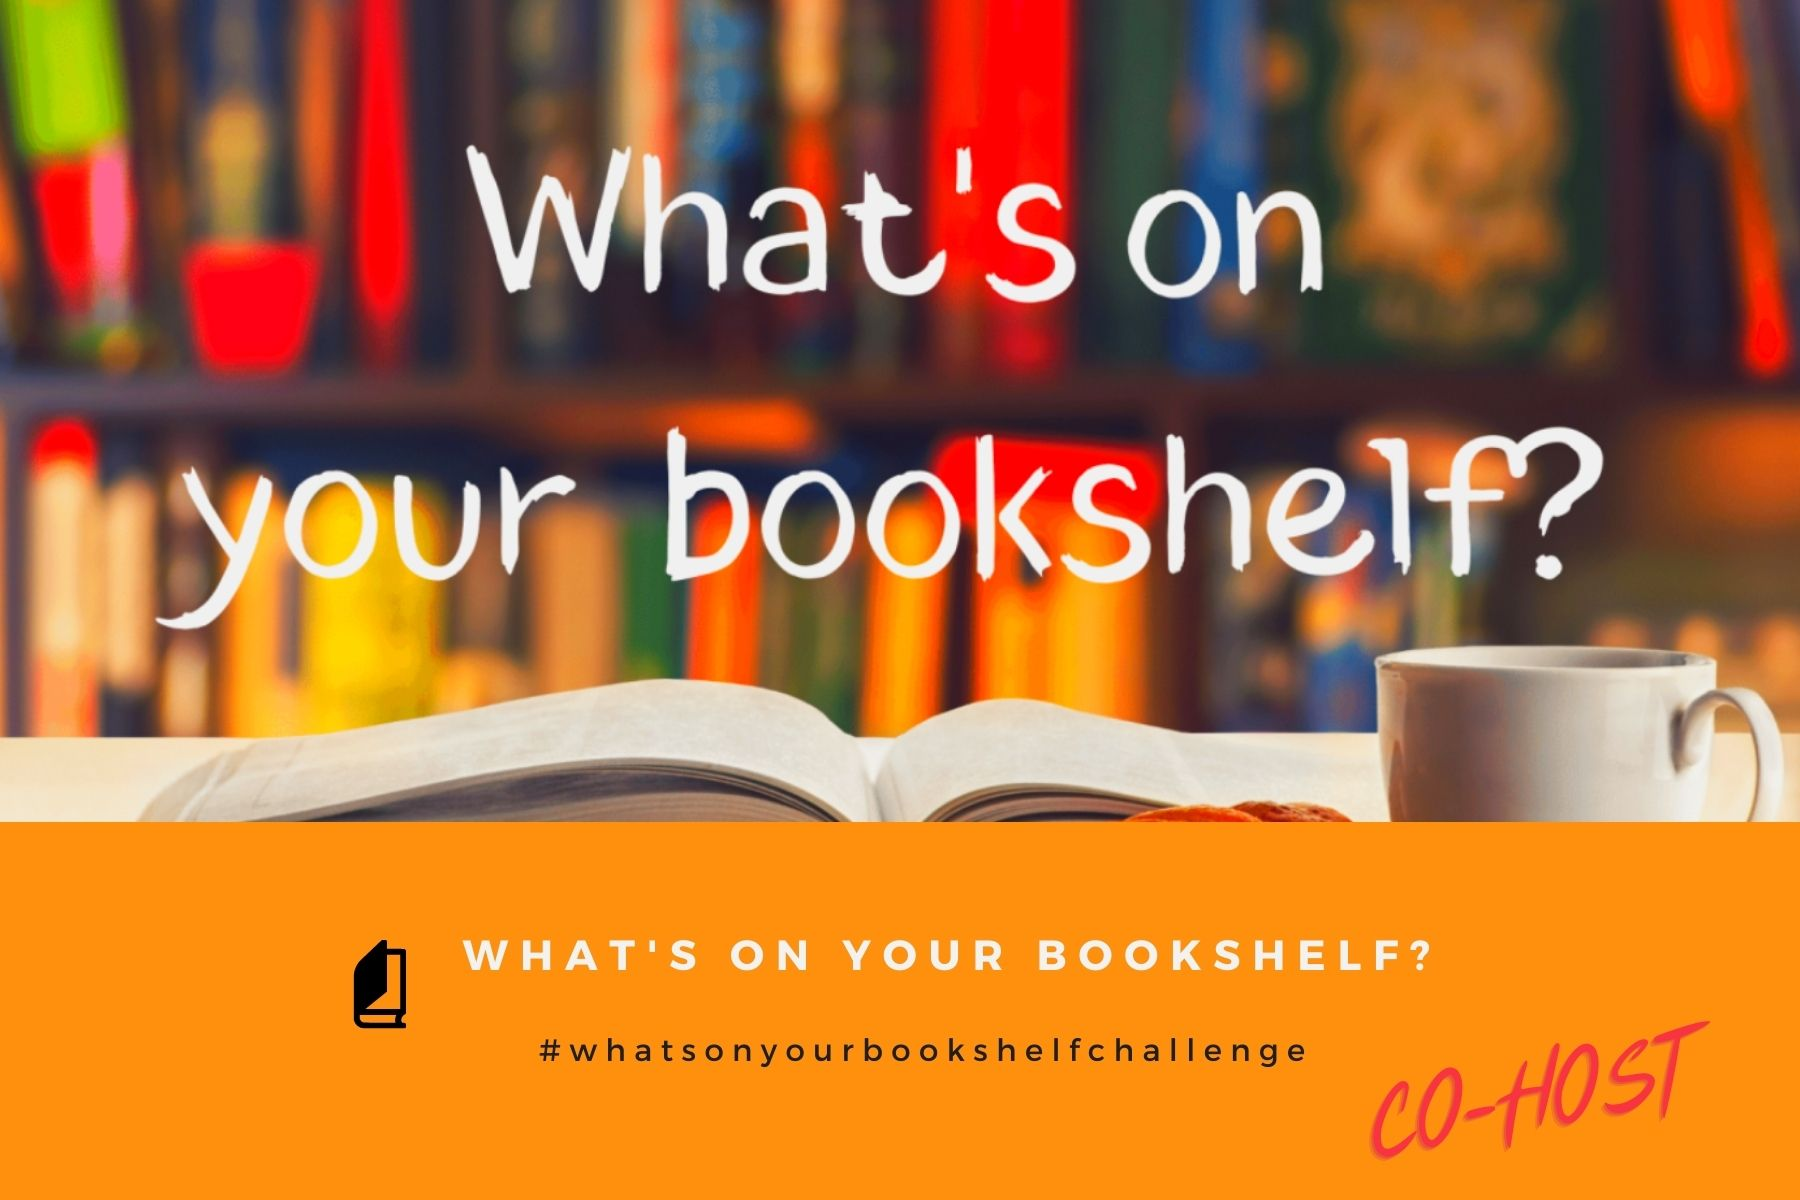 What's on your bookshelf badge